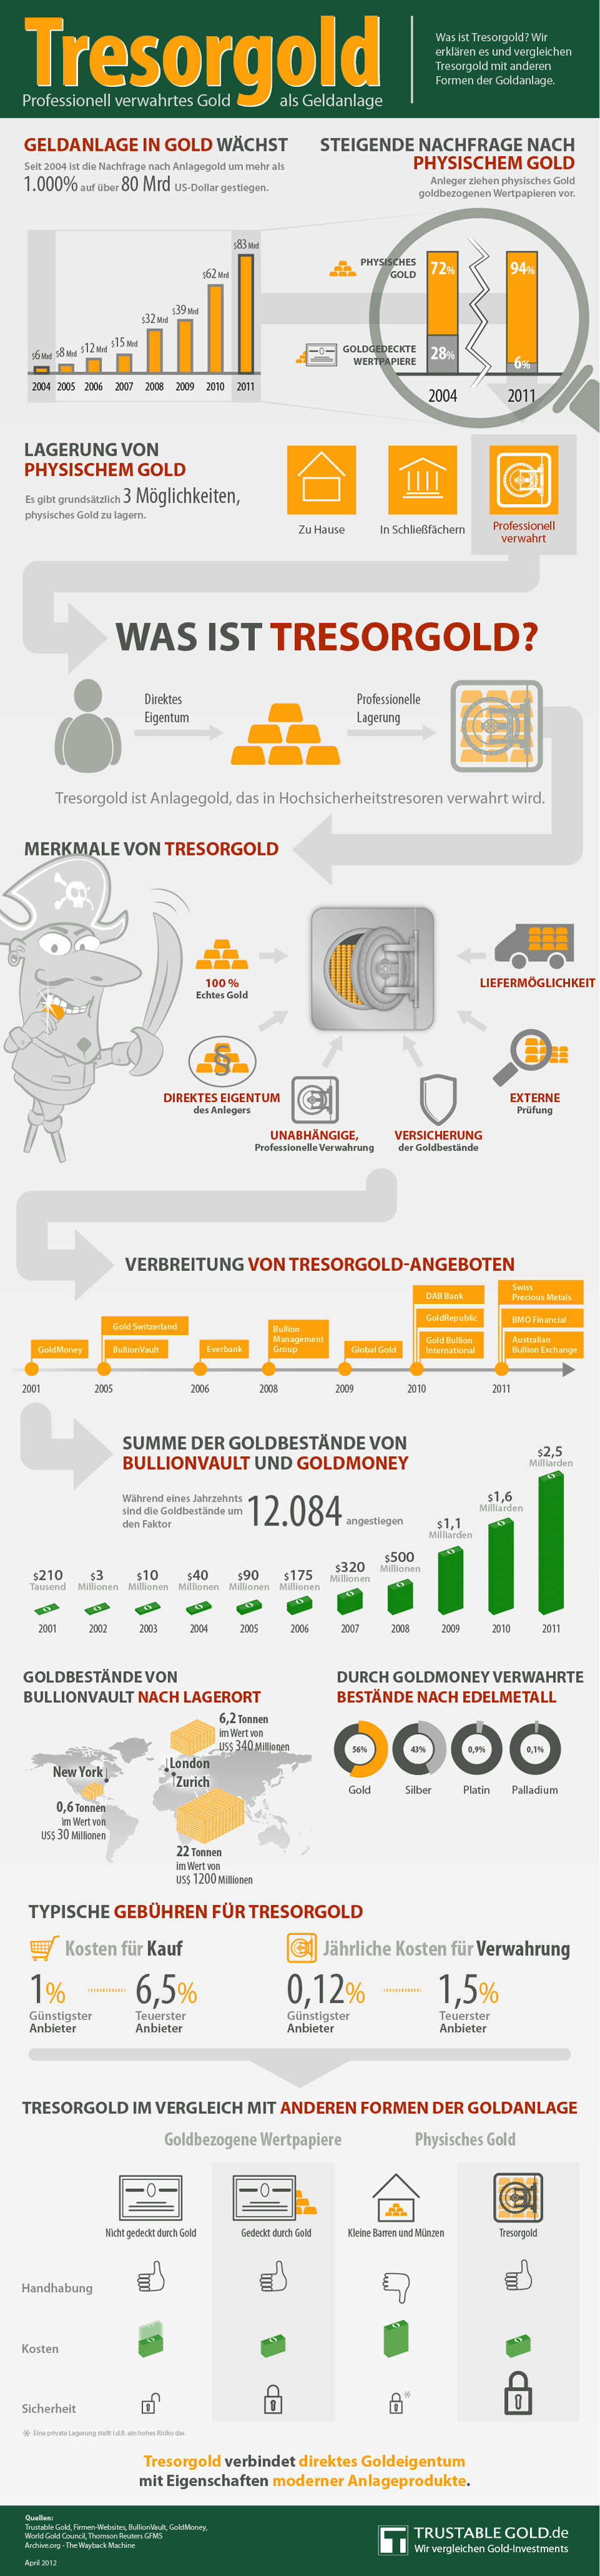 Infografik Tresorgold: Definition, Zahlen und Fakten